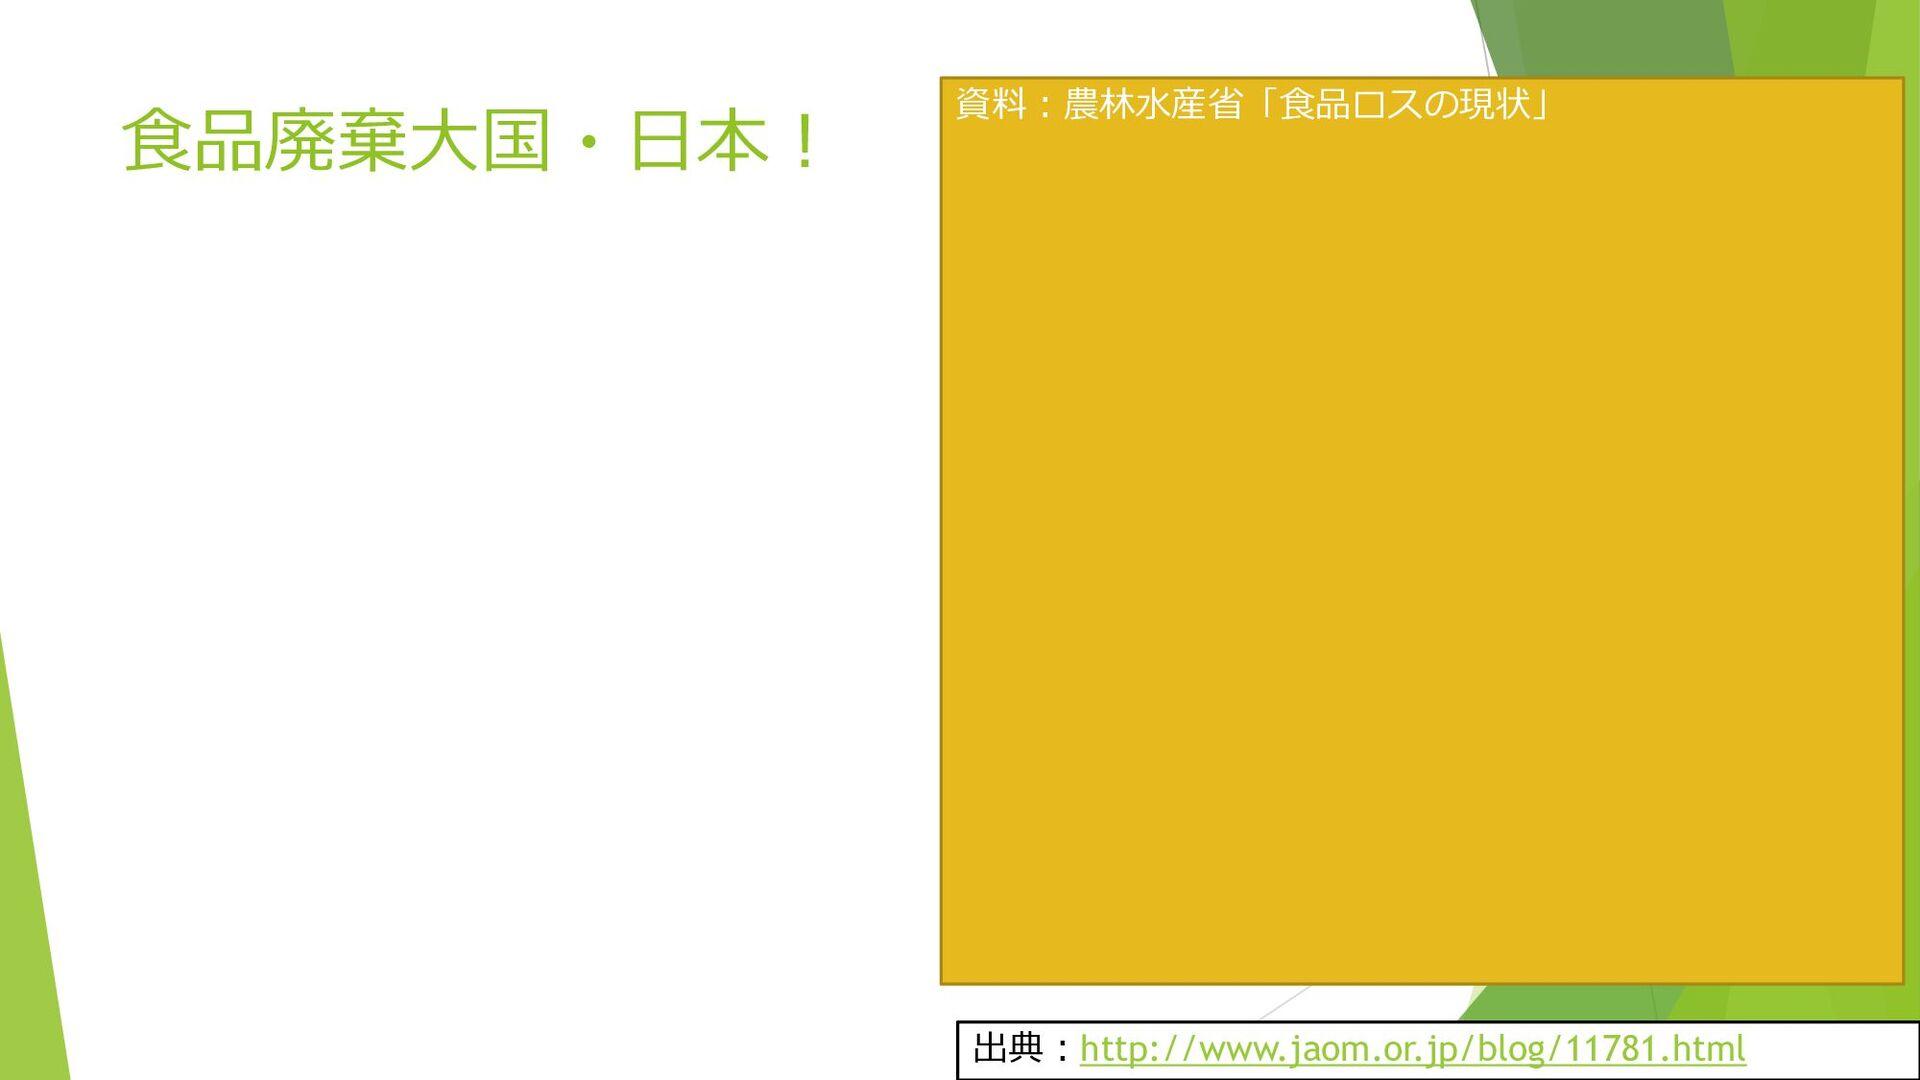 食品廃棄大国・日本! 出典:http://www.jaom.or.jp/blog/11781....